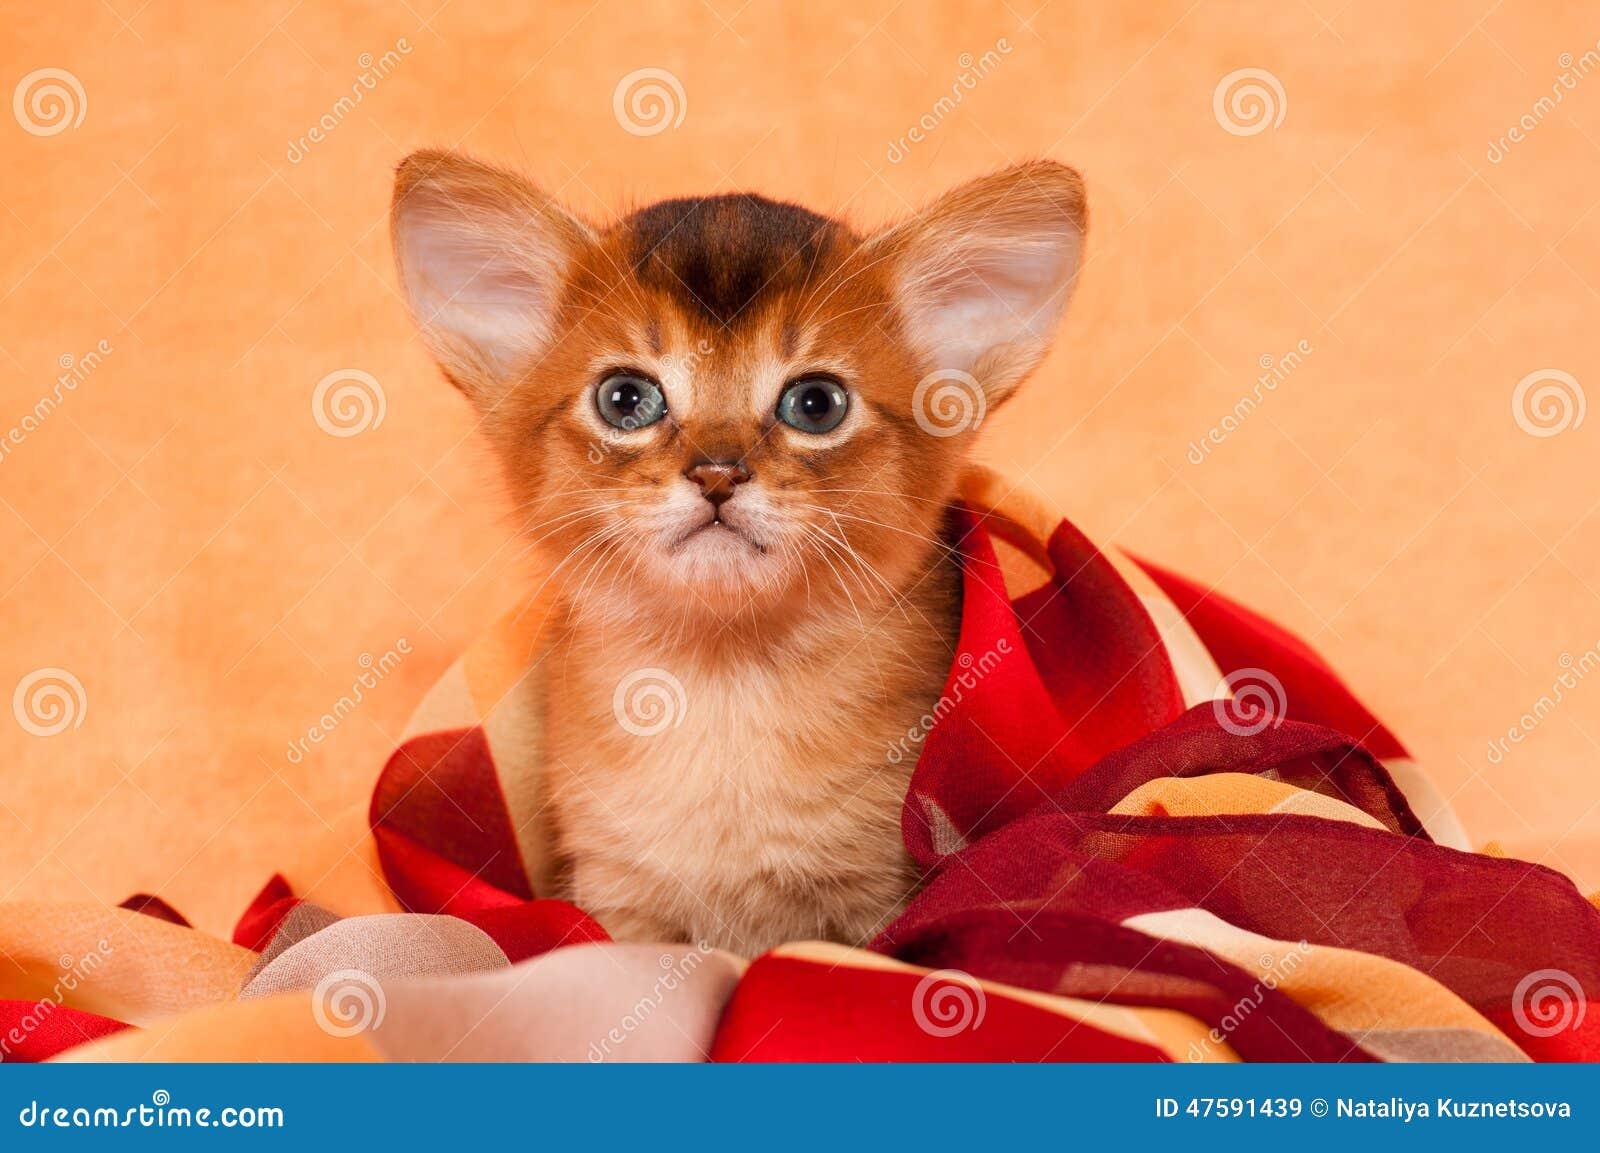 cute cat with big - photo #44